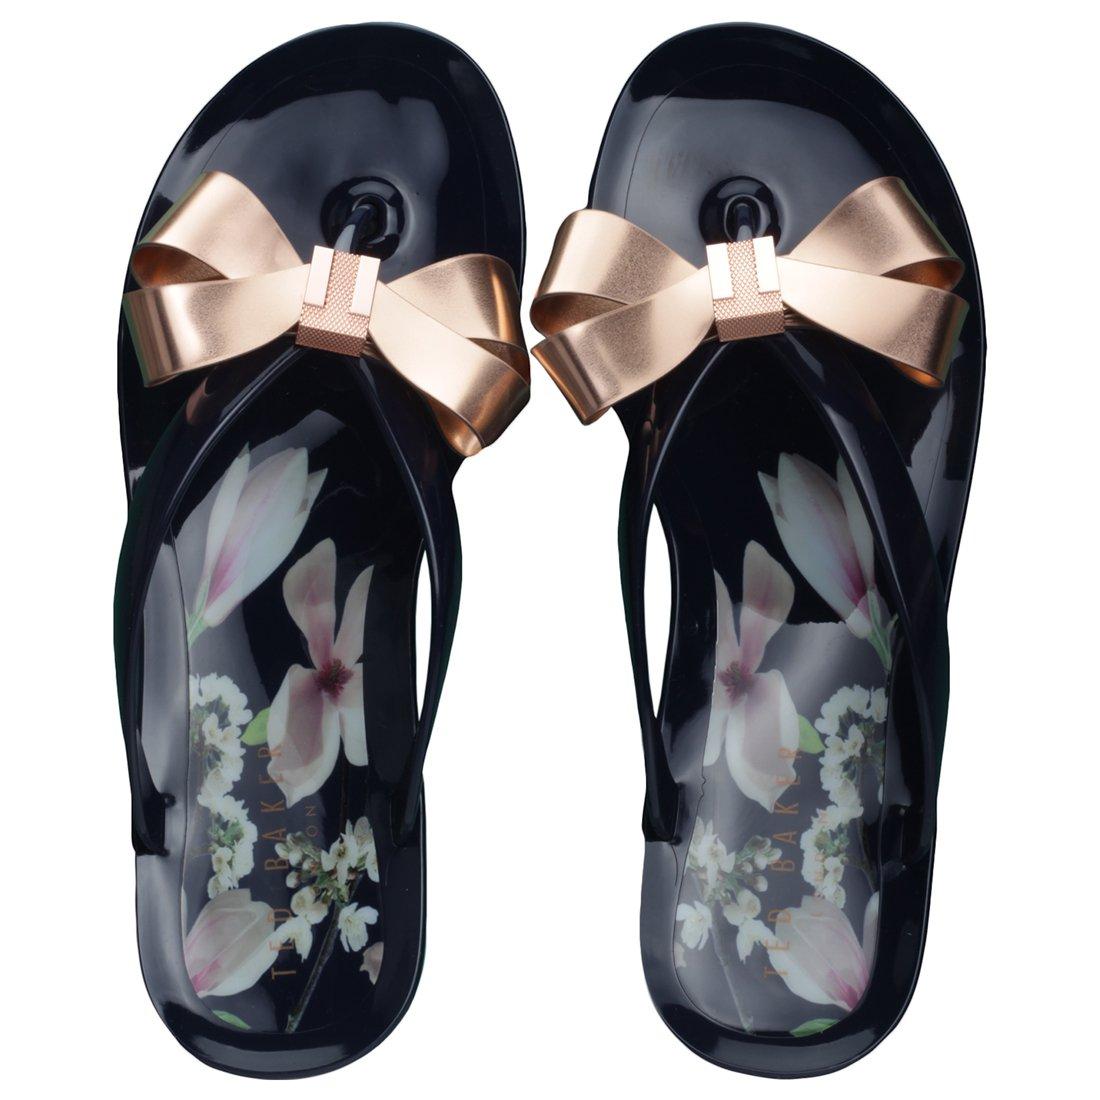 7802d9aeb Ted Baker Suzie Sandals Navy  Amazon.co.uk  Shoes   Bags